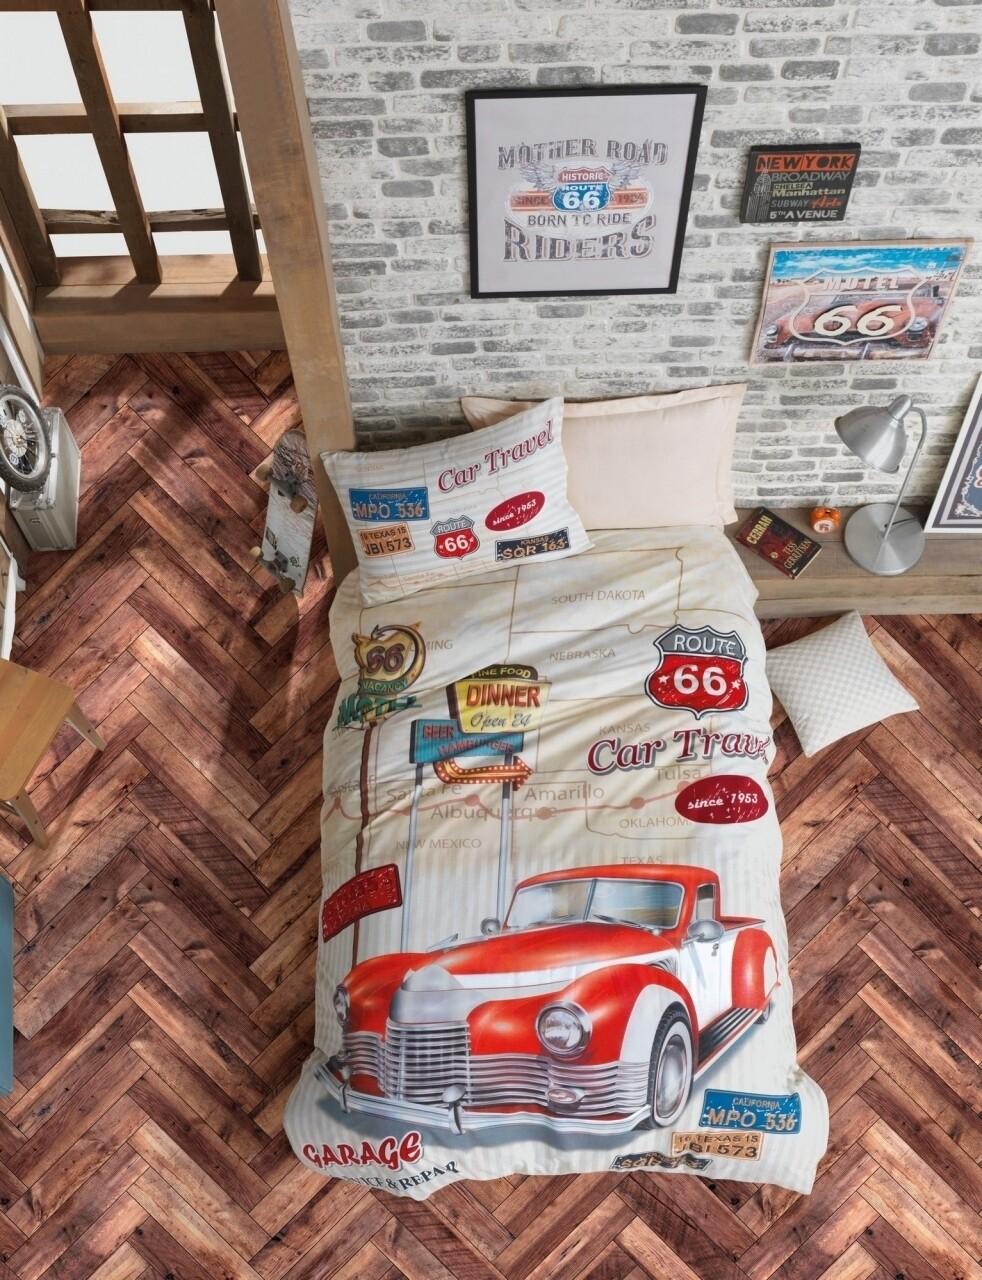 Lenjerie de pat pentru o persoana, 3 piese, 100% bumbac ranforce, Cotton Box, Route